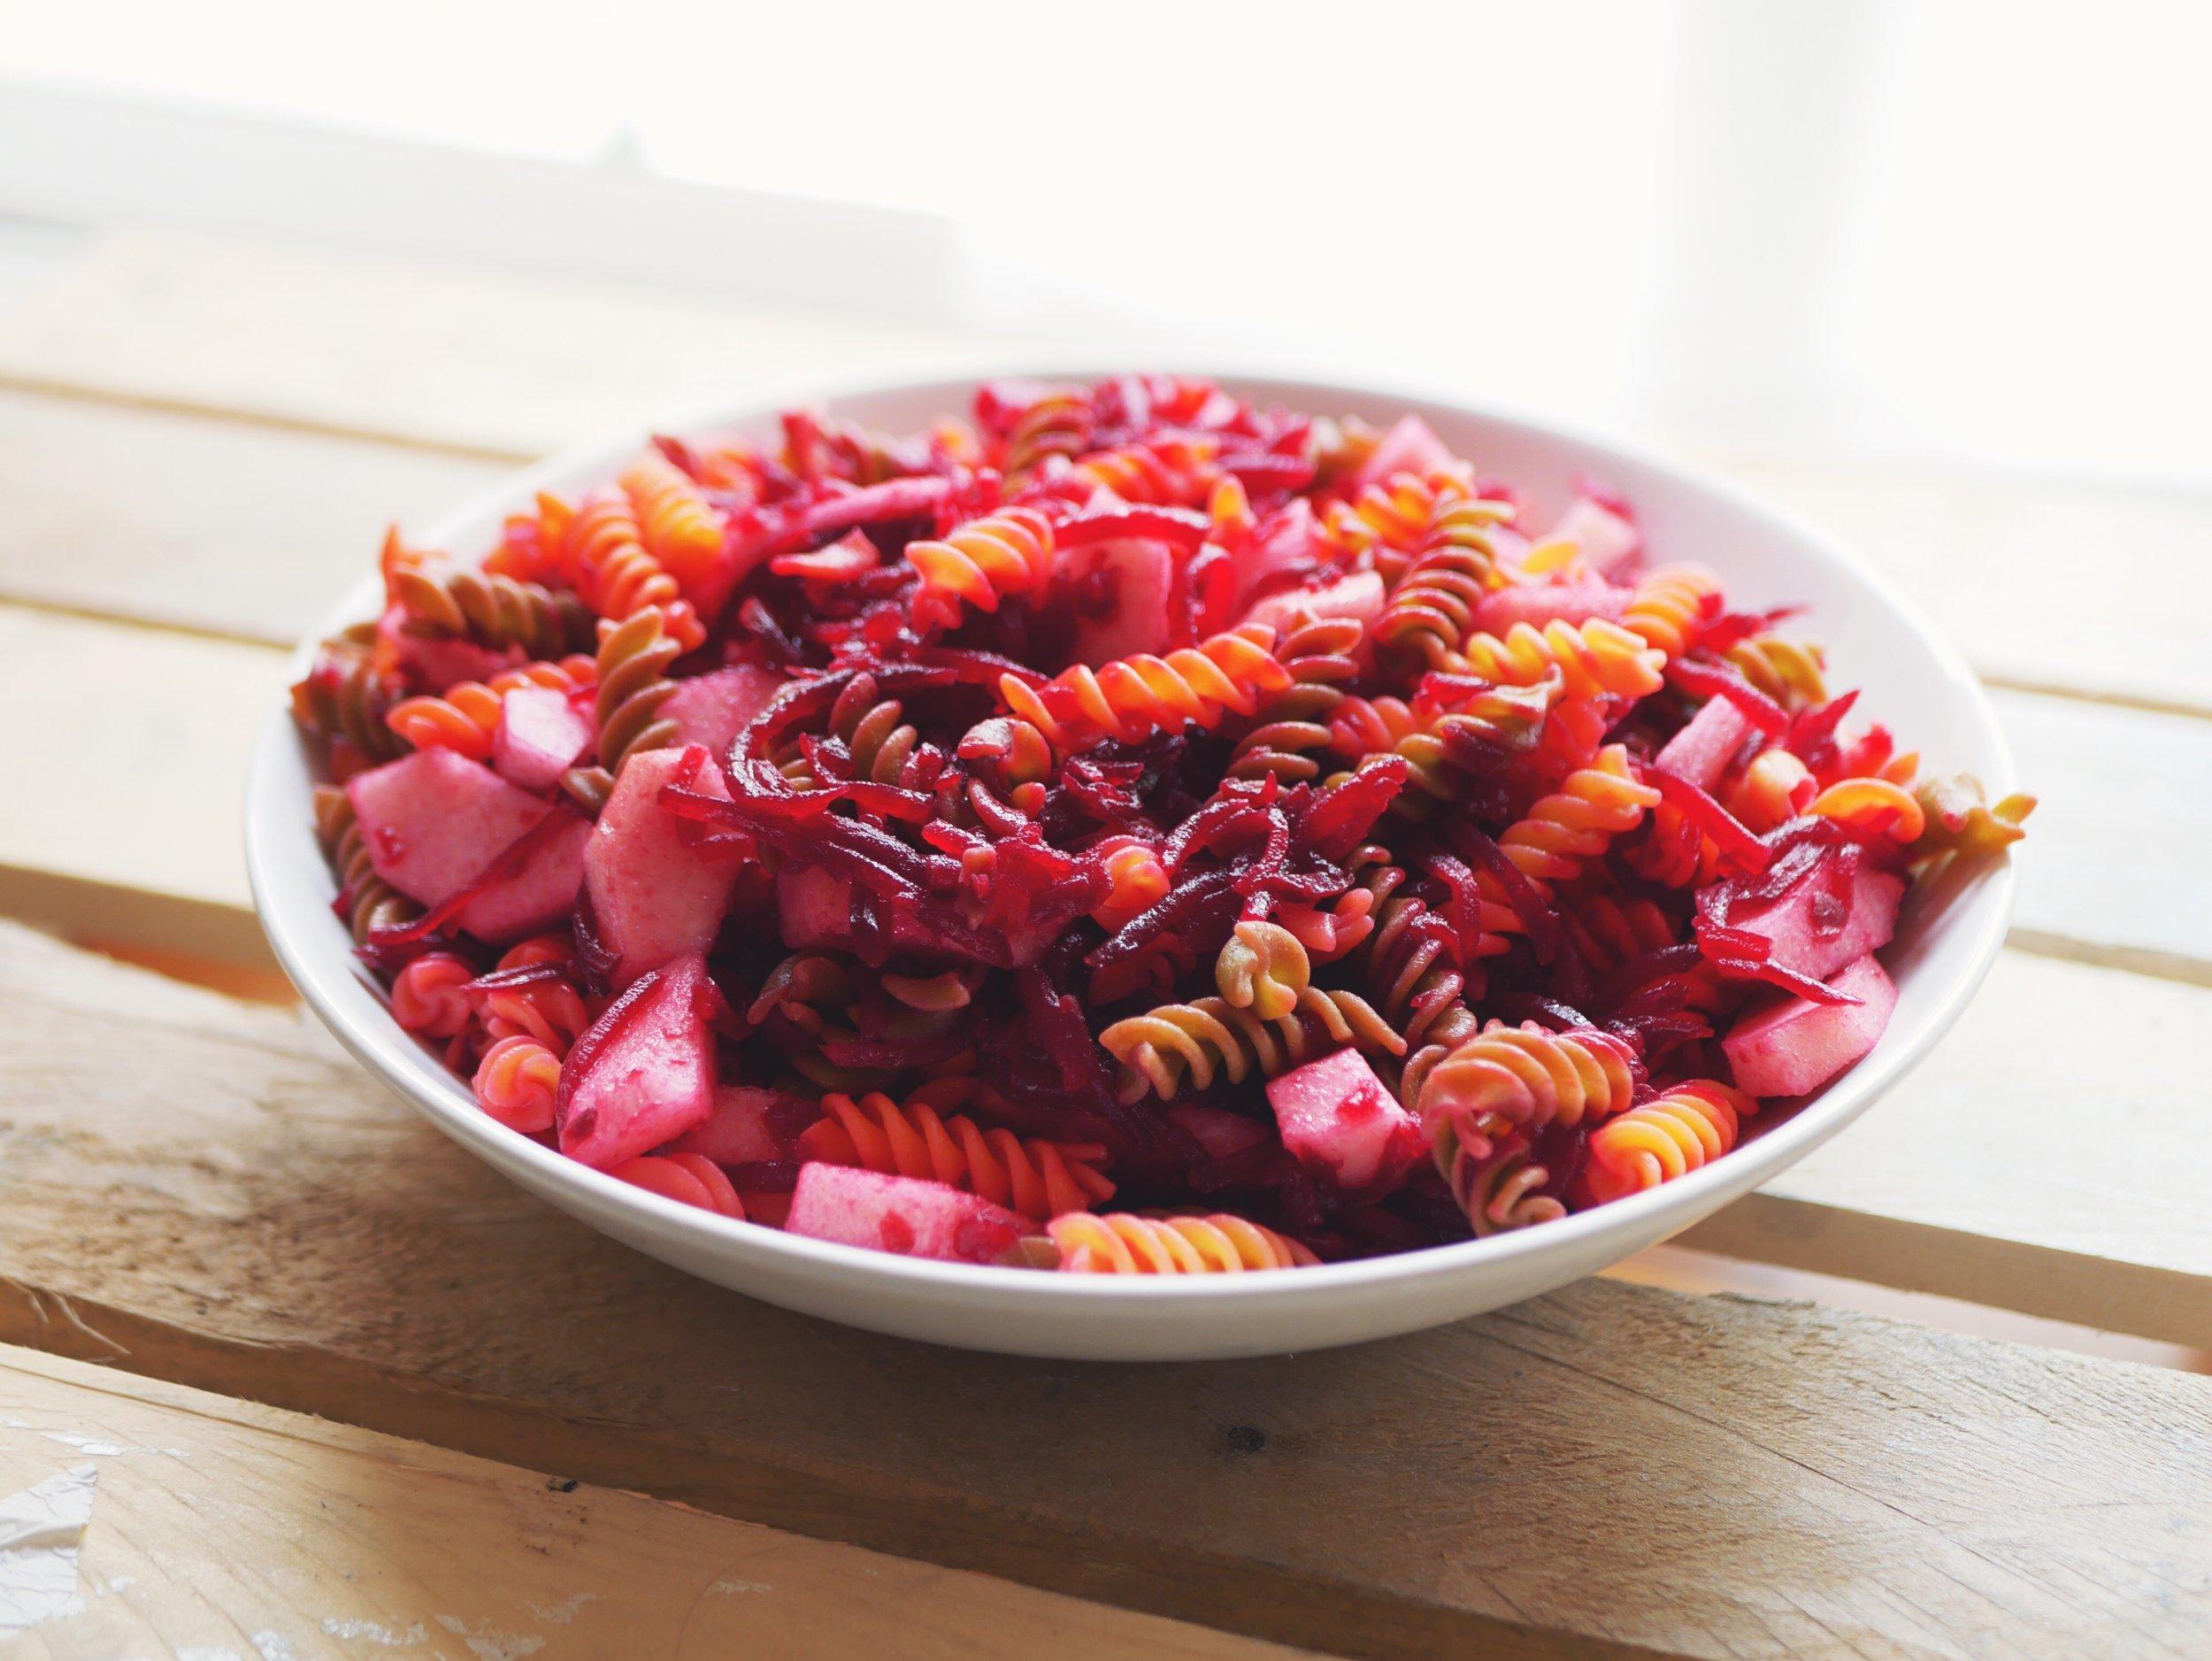 pink pasta salad